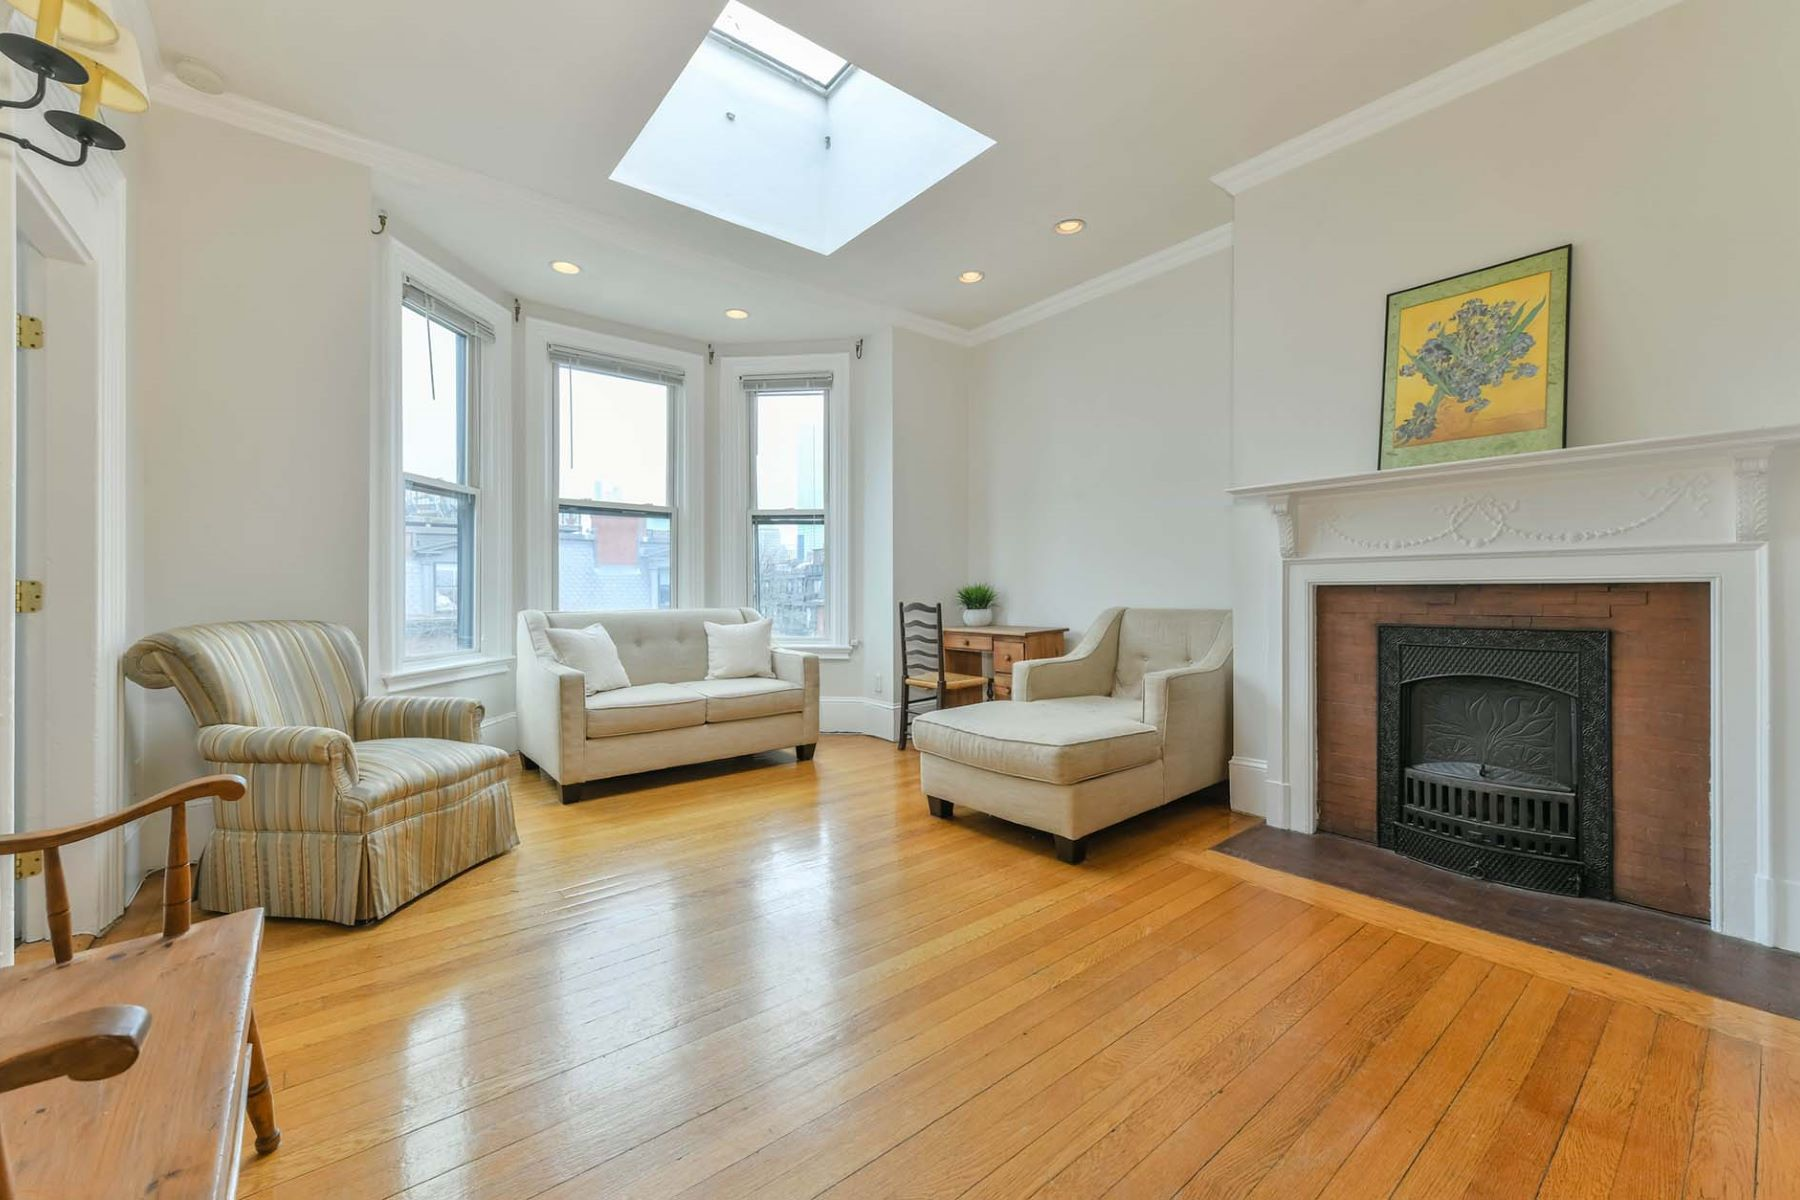 Condominium for Sale at 7 Hereford St 8, Boston 7 Hereford St #8 Boston, Massachusetts 02115 United States